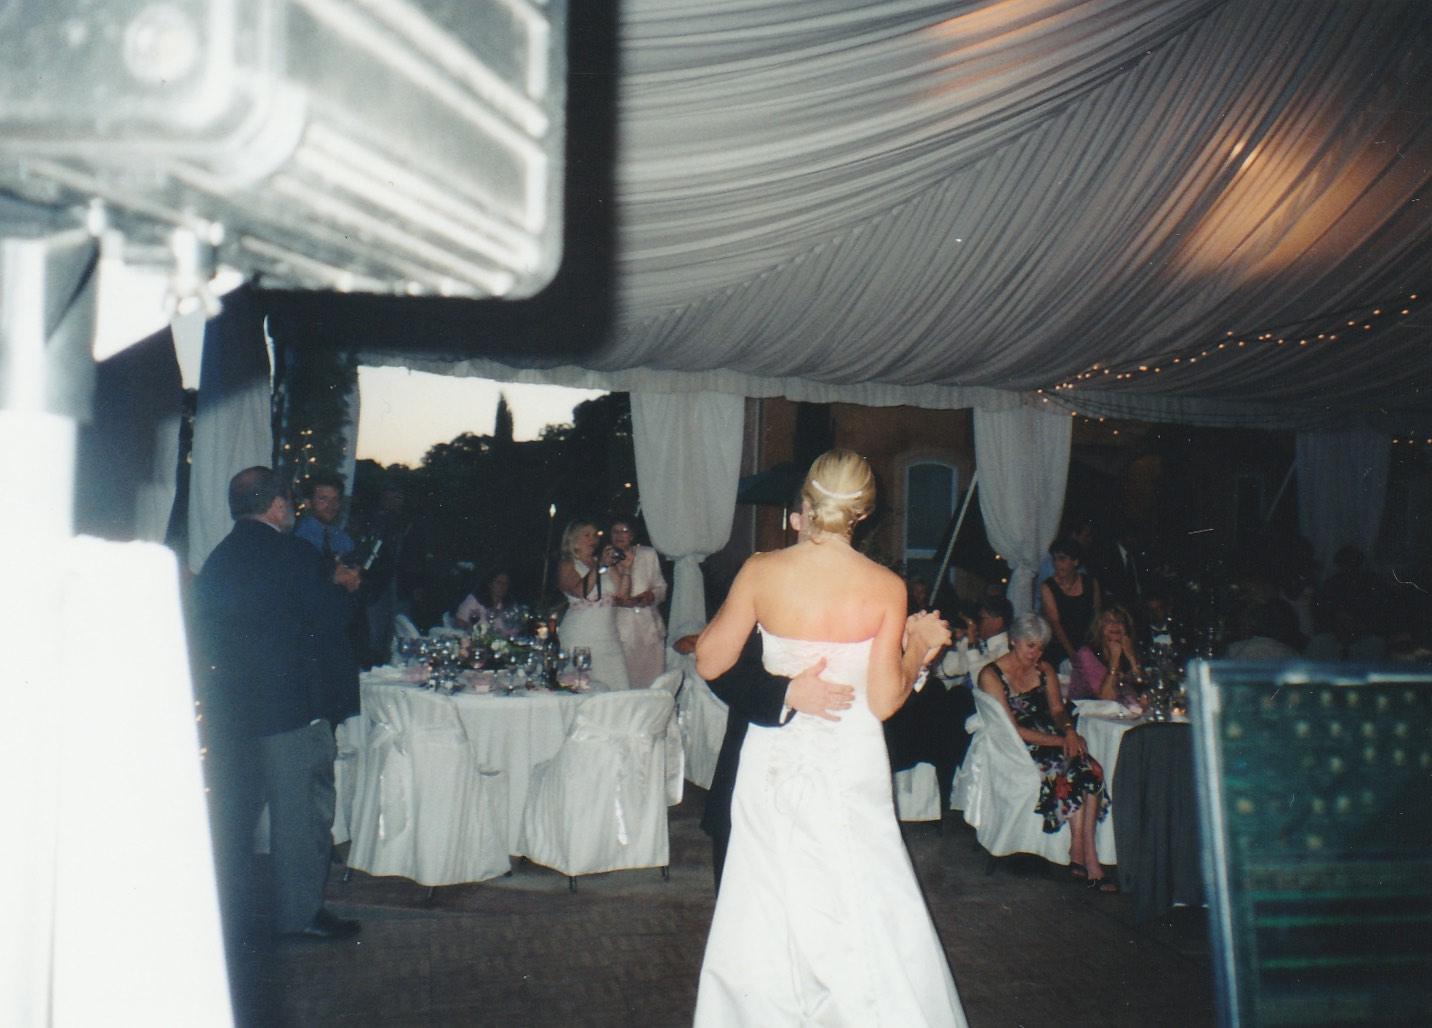 Villa Toscano Winery for a wedding